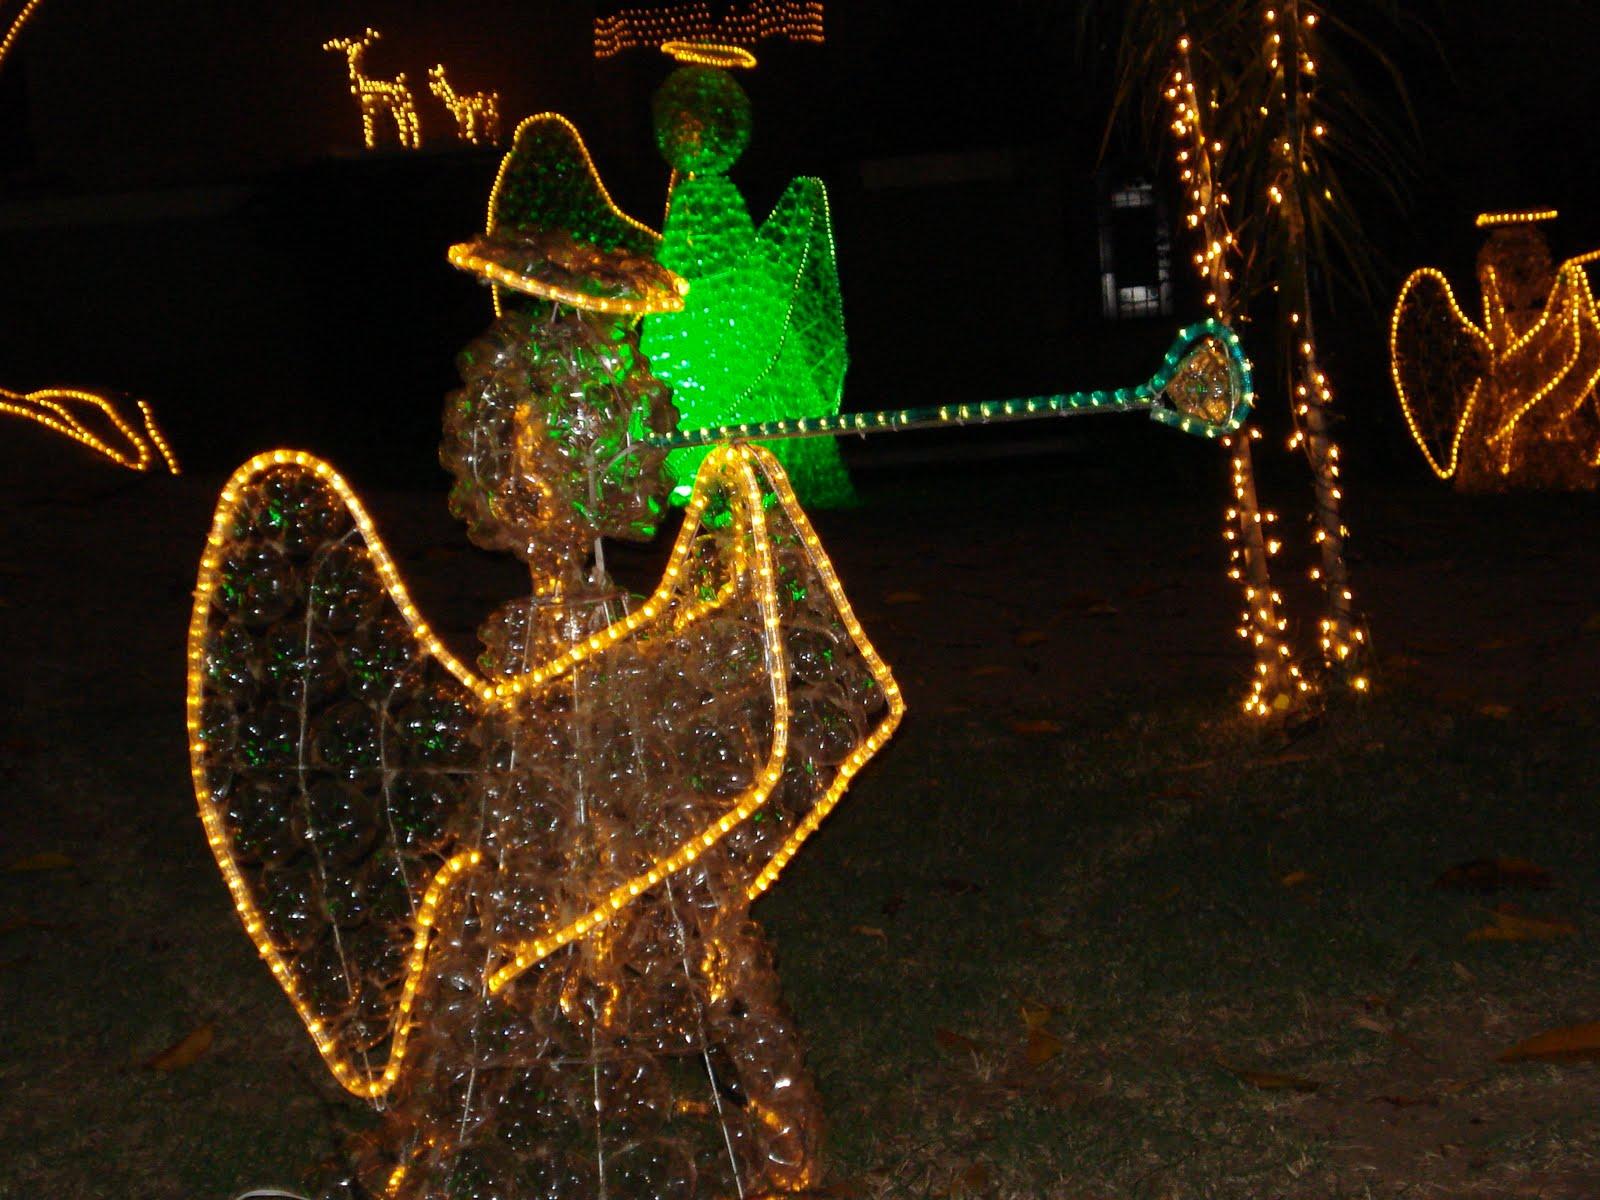 enfeites luminosos de natal para jardim : enfeites luminosos de natal para jardim:ENFEITES LUMINOSOS: Outubro 2010